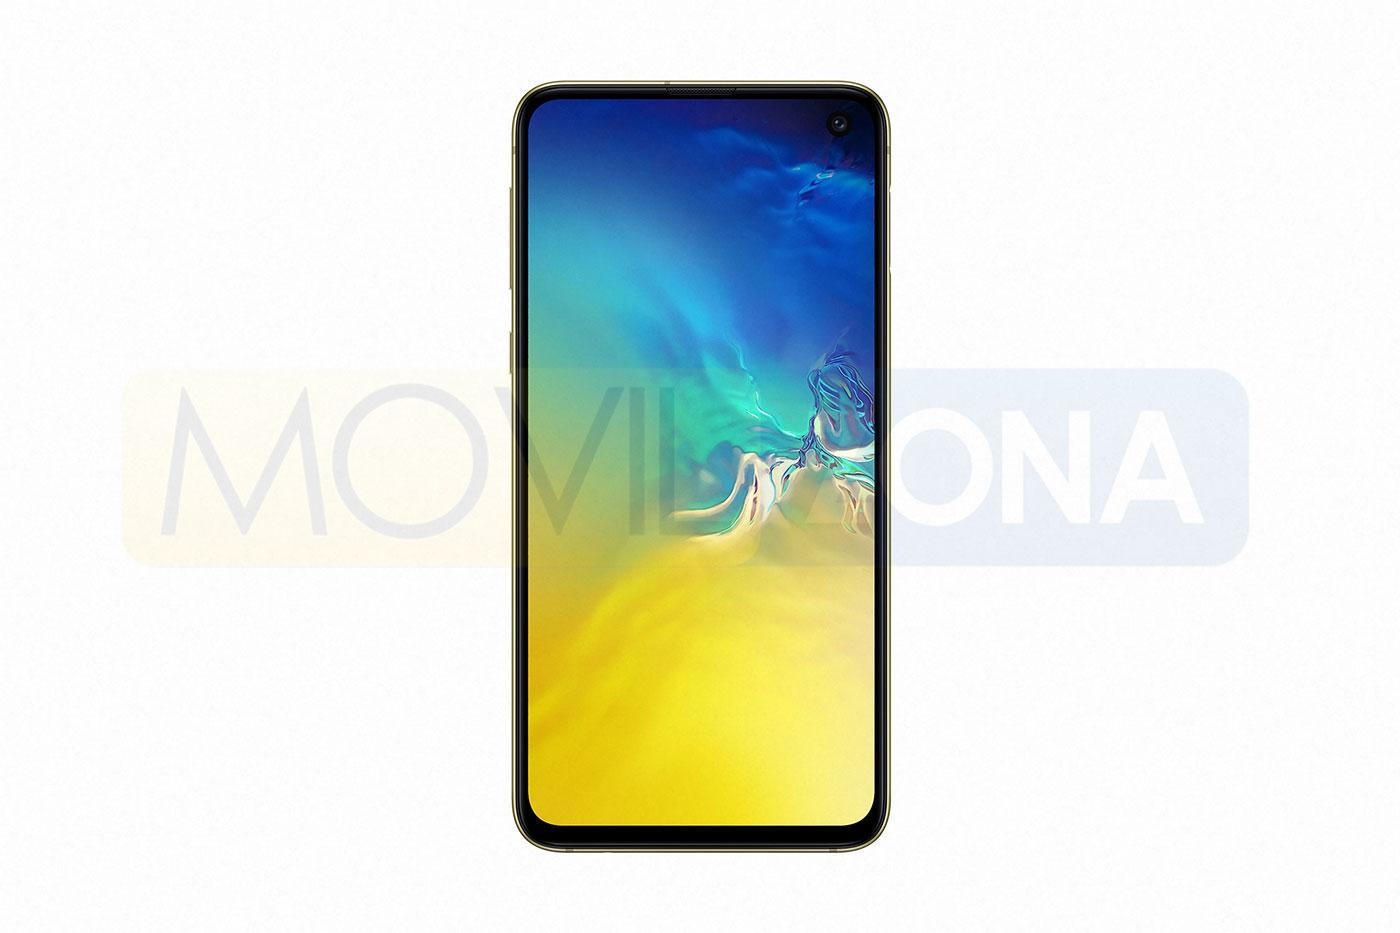 Samsung Galaxy S10e frontal color amarillo